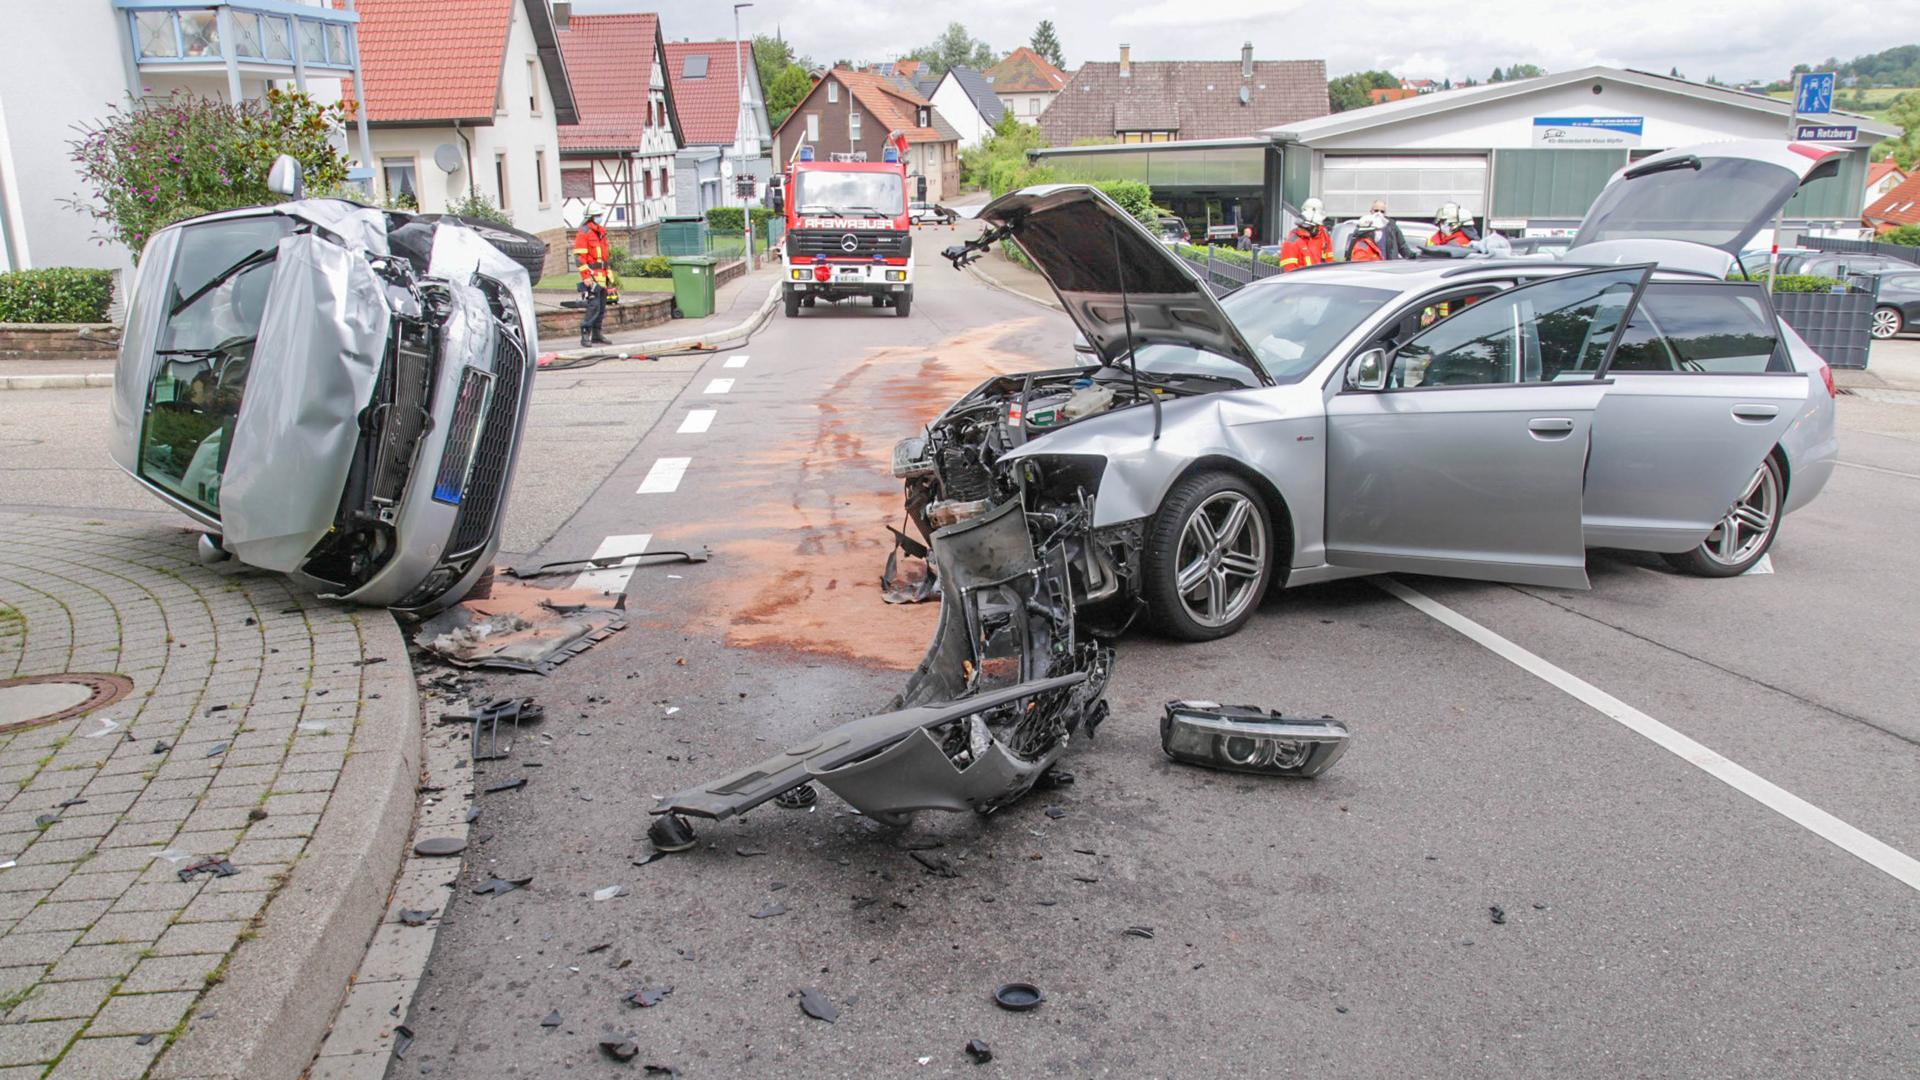 Bei dem Unfall in Ettlingen-Schöllbronn wurden zwei Menschen verletzt.